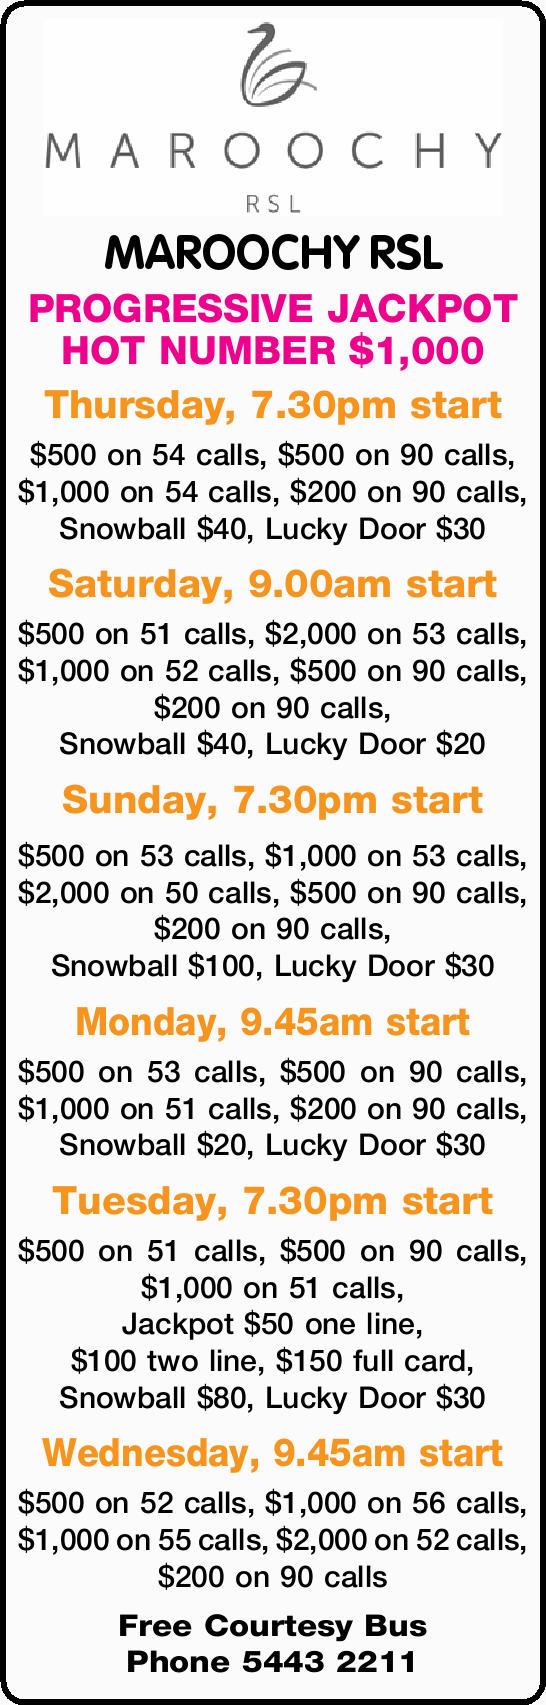 Thursday, 7.30pm start $500 on 54 calls, $500 on 90 calls, $1,000 on 54 calls, $200 on 90 c...